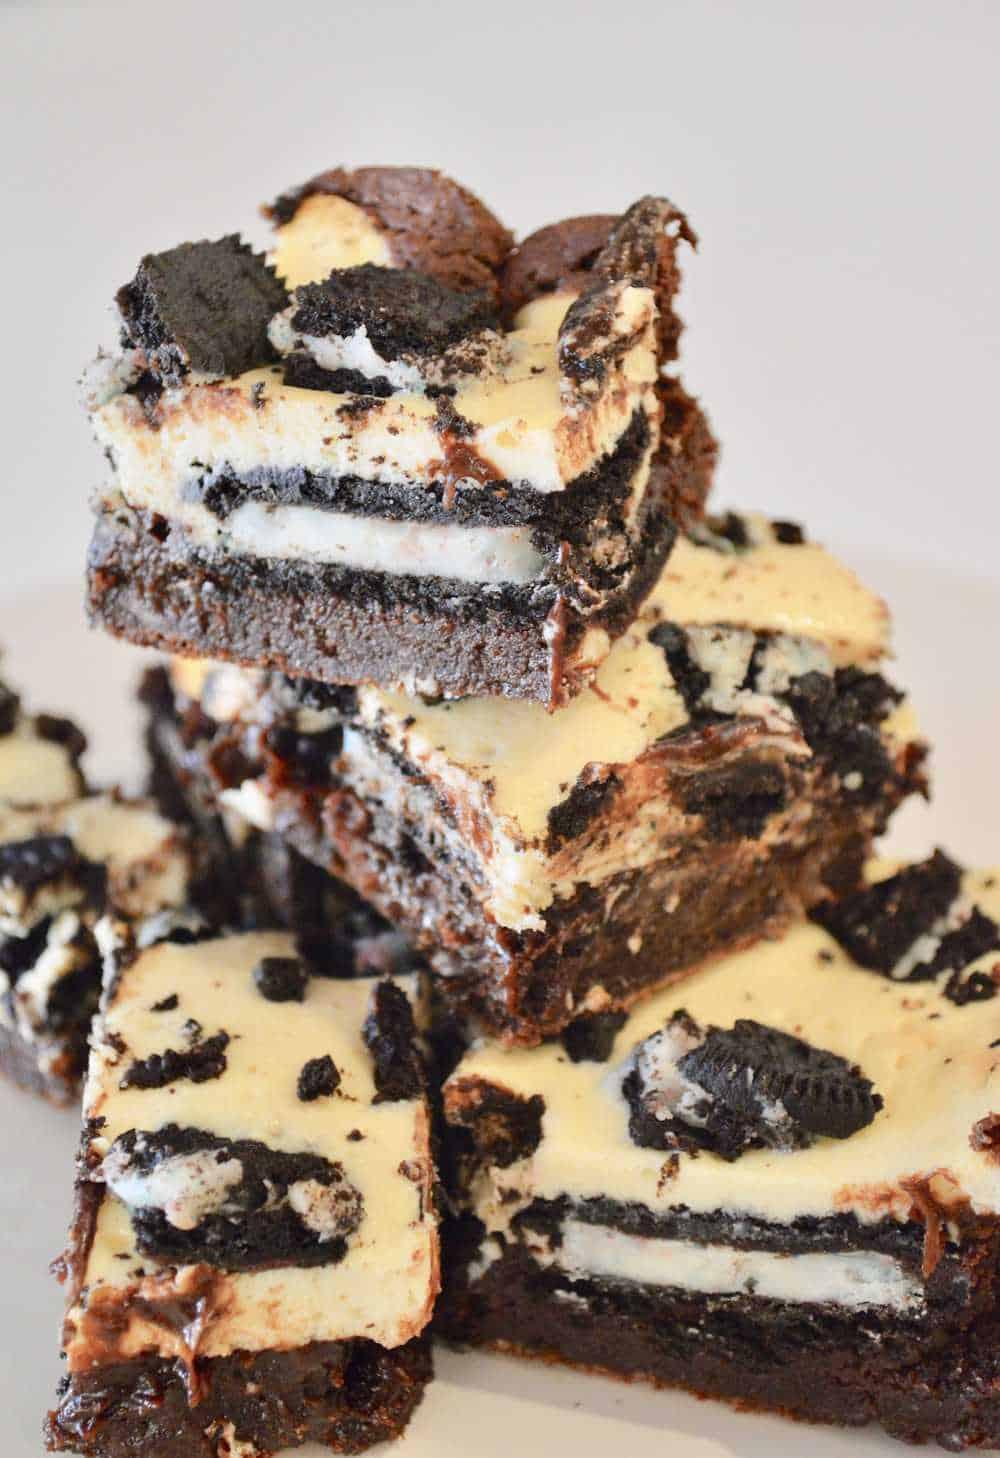 Oreo Cheesecake Brownie Bars piled on a white plate